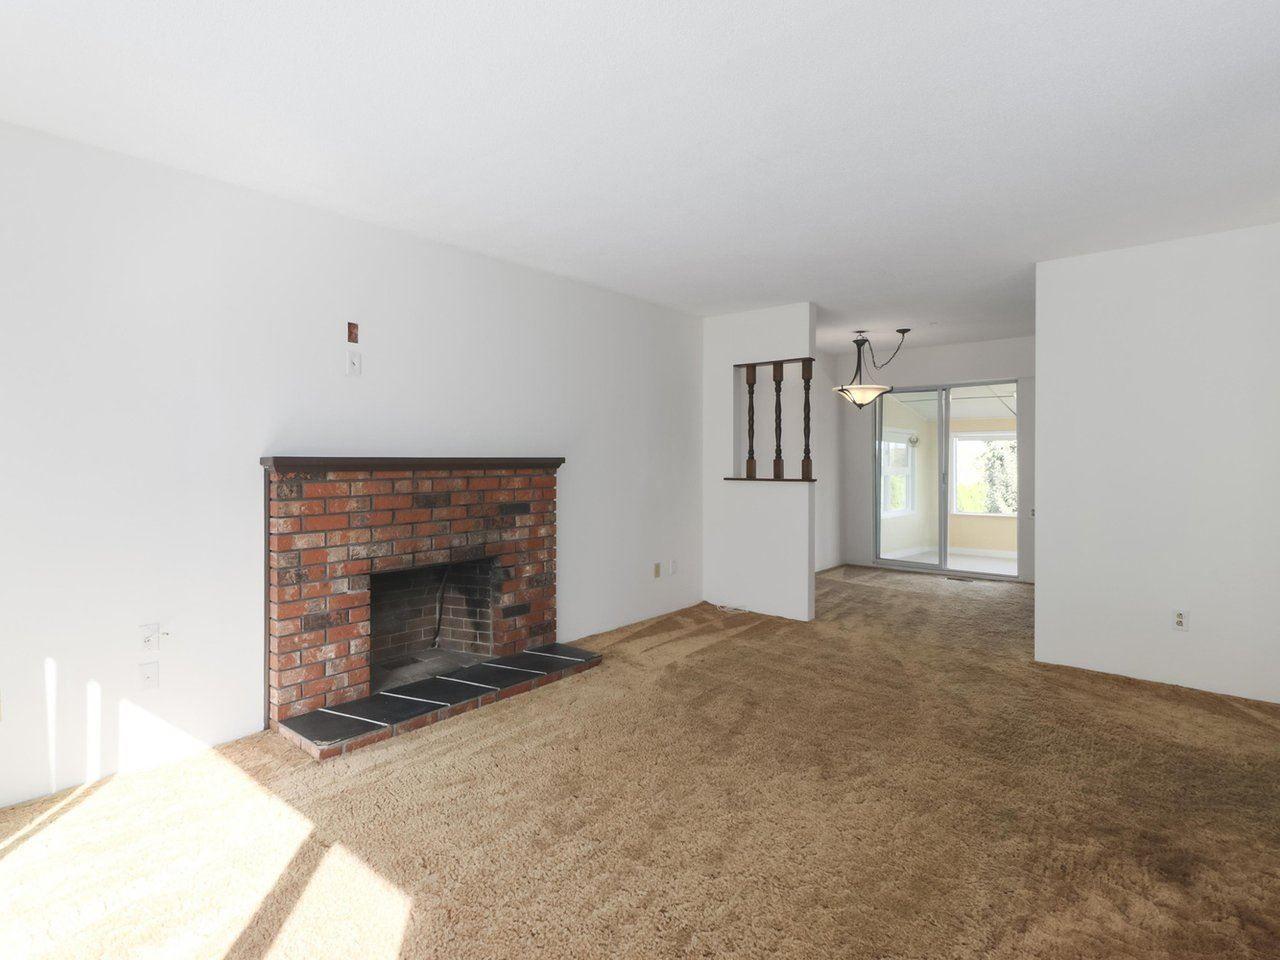 Photo 5: Photos: 1426 KENT Street: White Rock House for sale (South Surrey White Rock)  : MLS®# R2406738